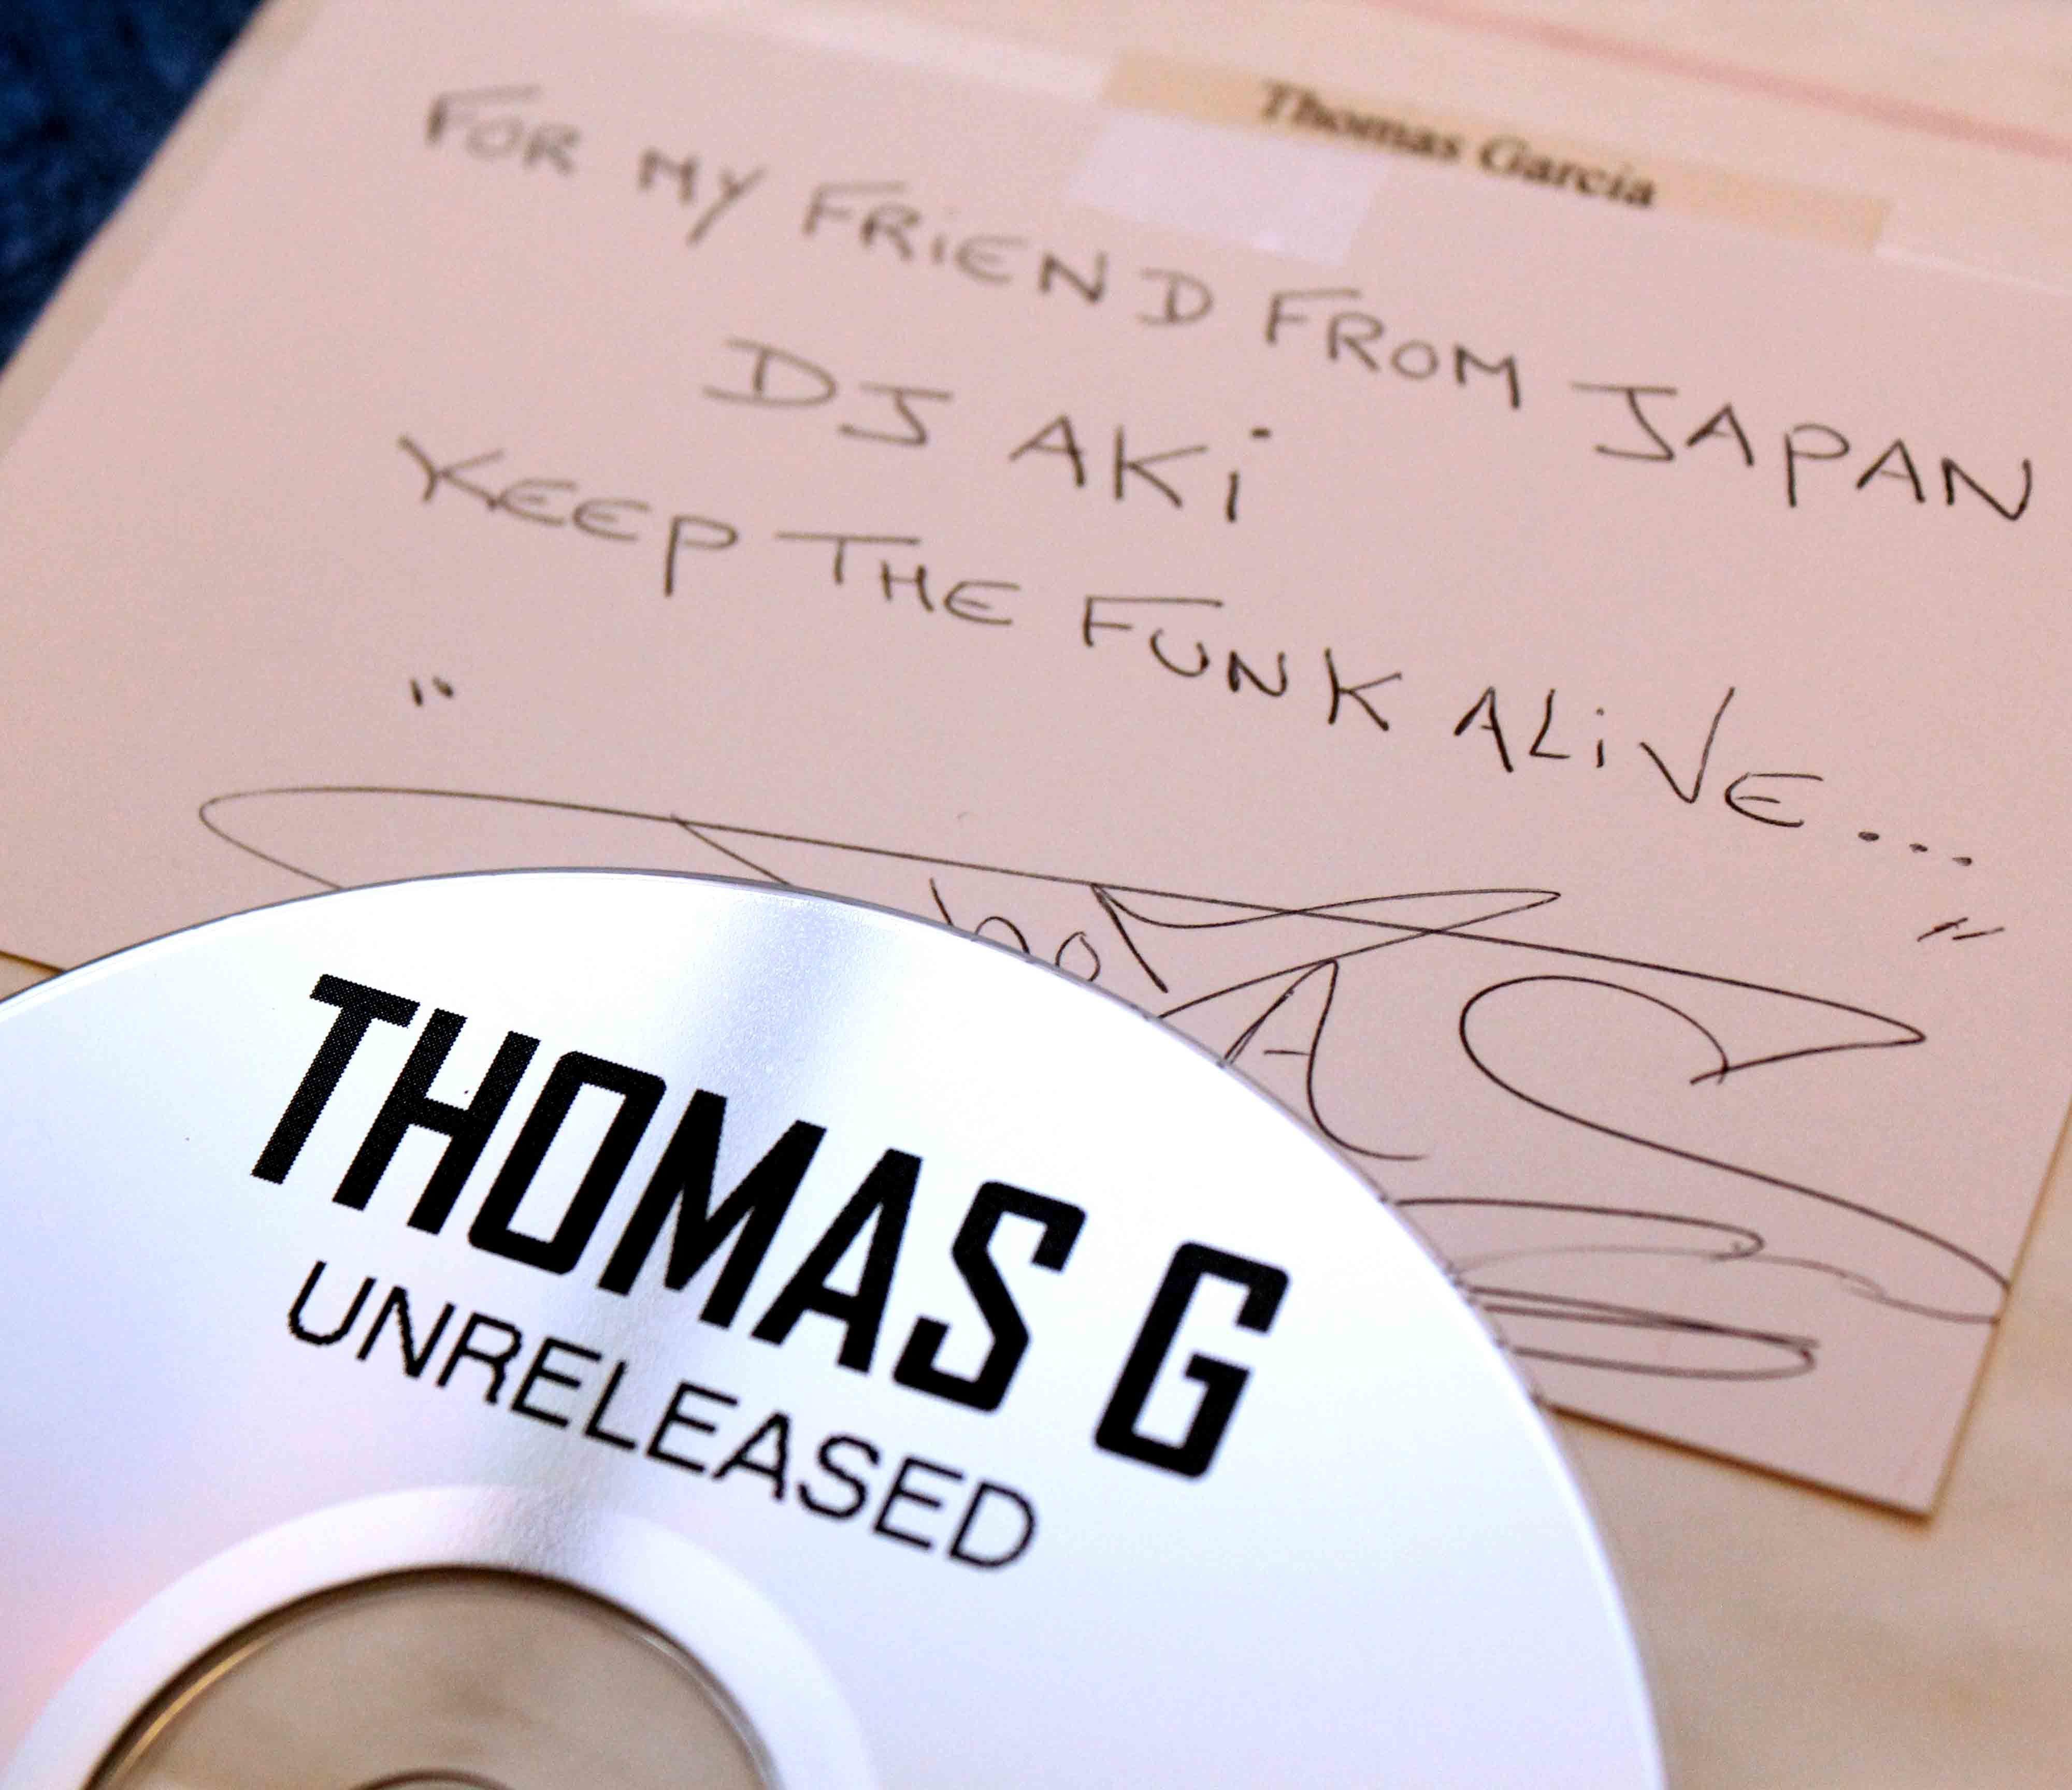 Thomas G – Unreleased 04